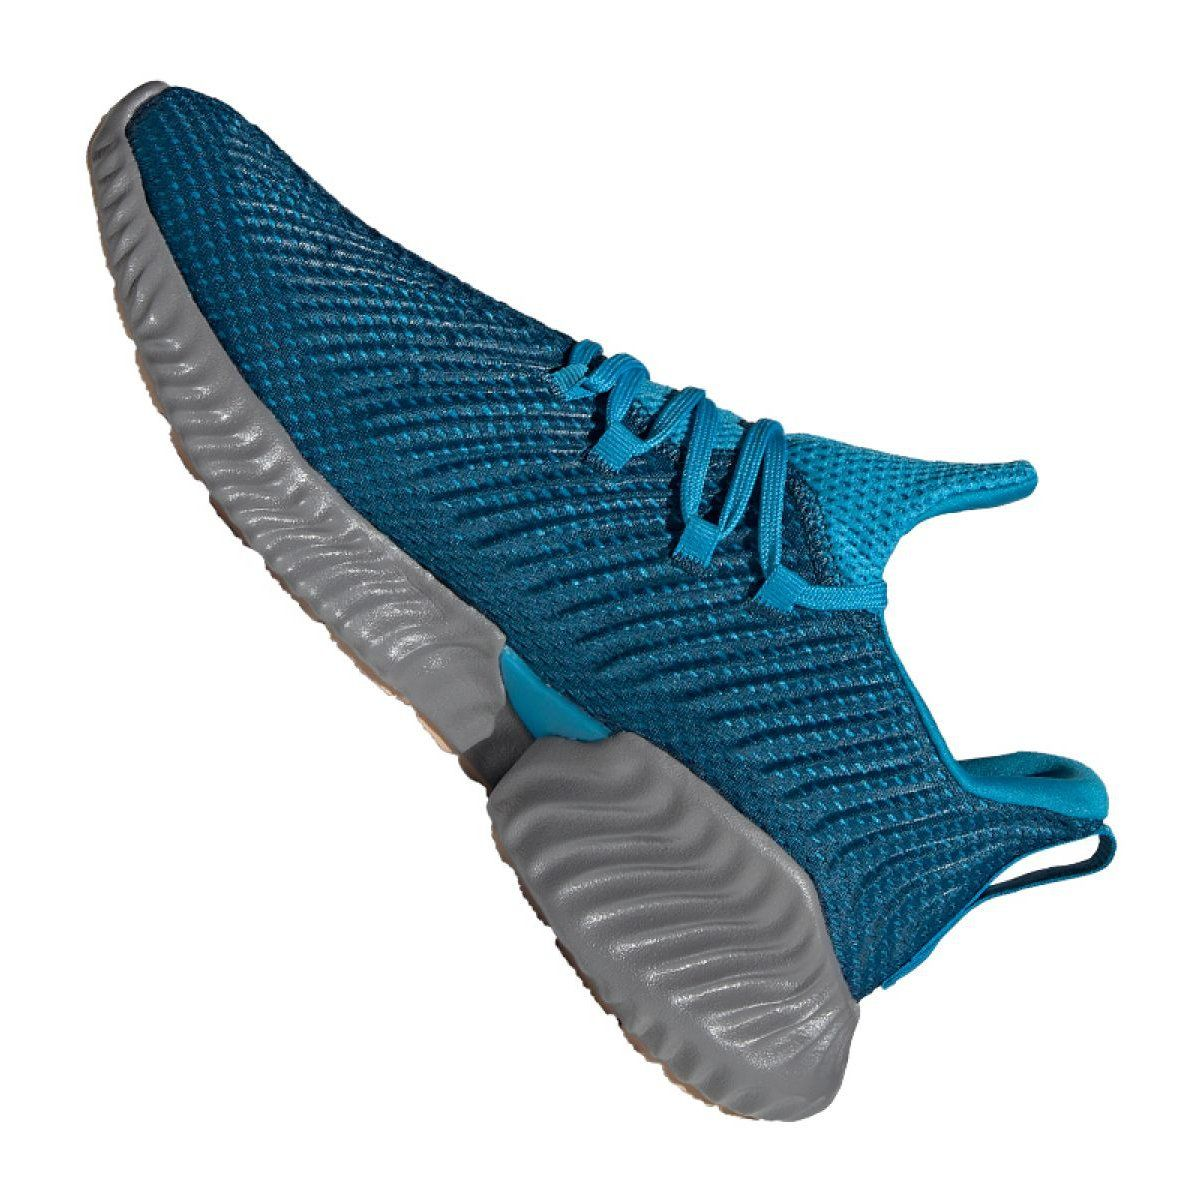 Buty Adidas Alphabounce Instinct M Bd7112 Niebieskie Adidas Blue Shoes Adidas Running Shoes